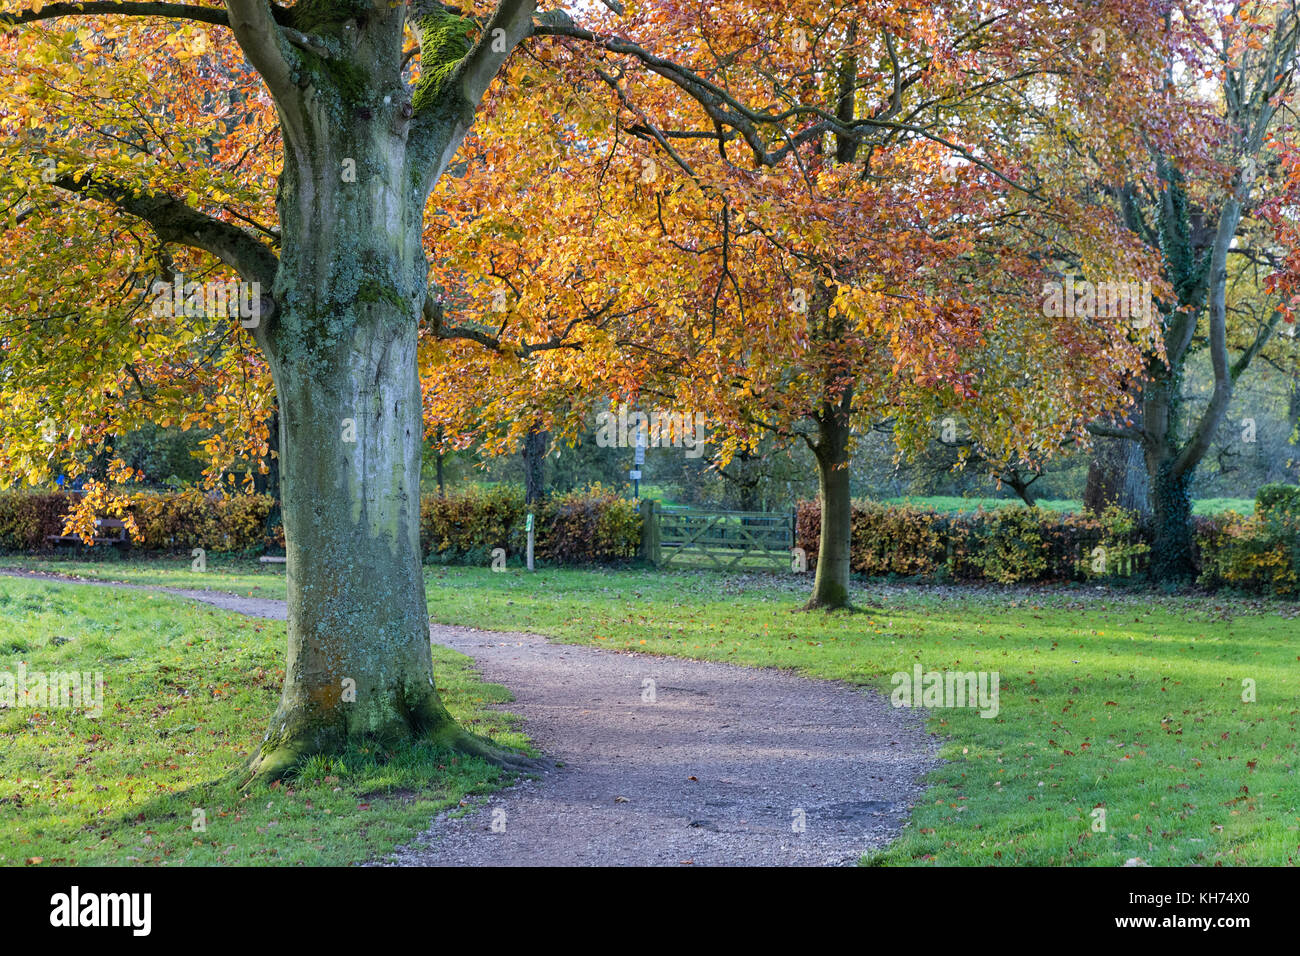 Abbey Fields Kenilworth - Stock Image